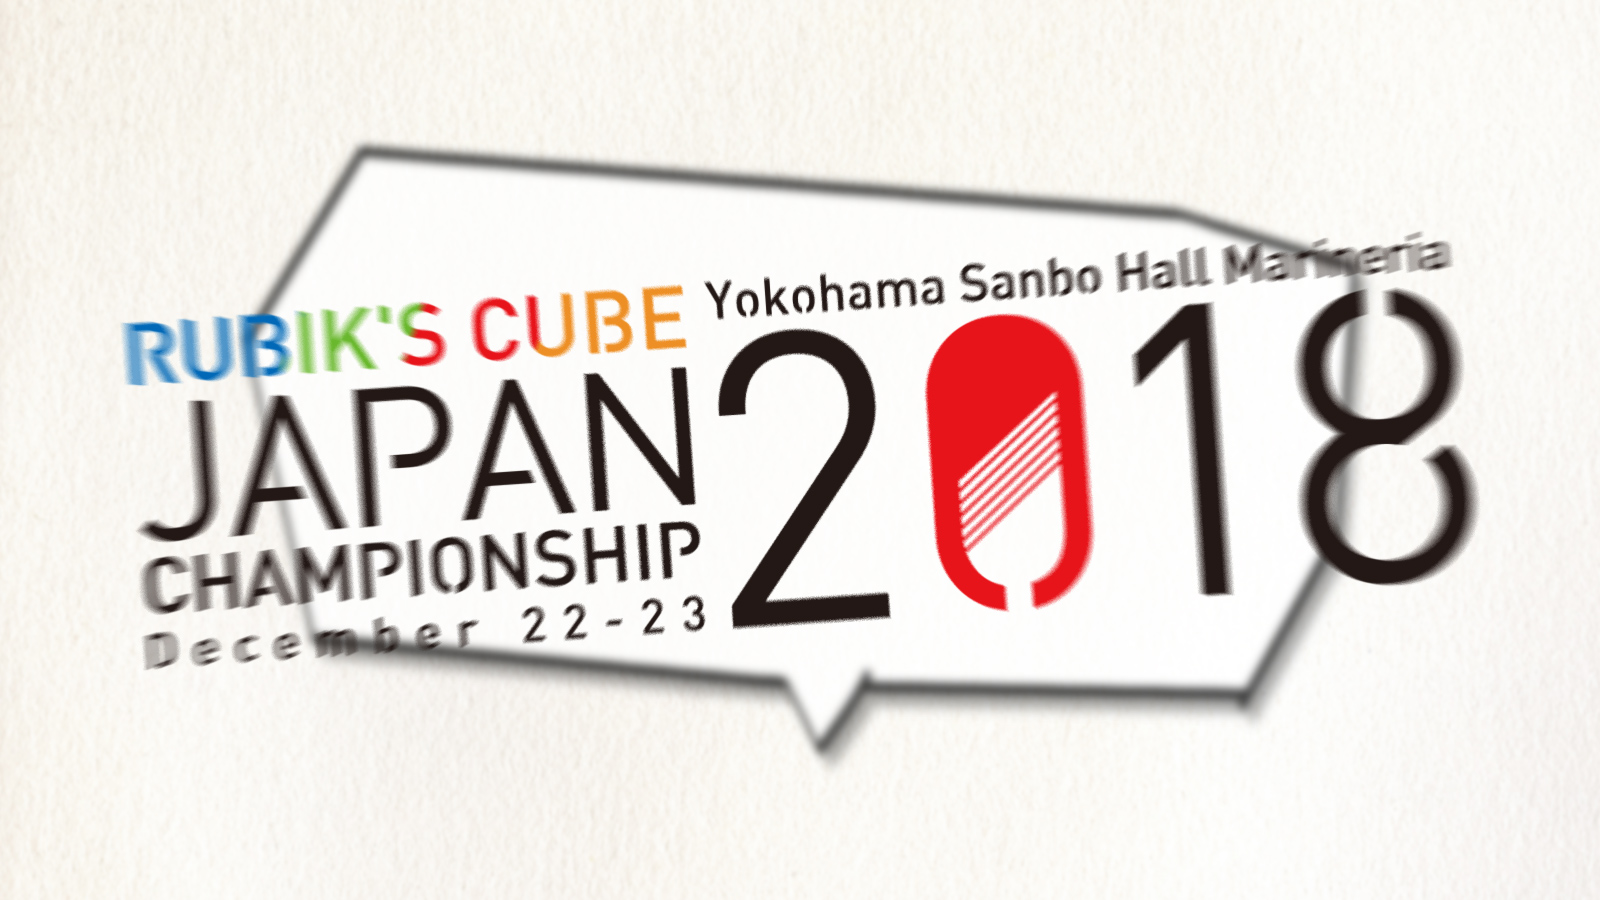 Japan Championship 2018